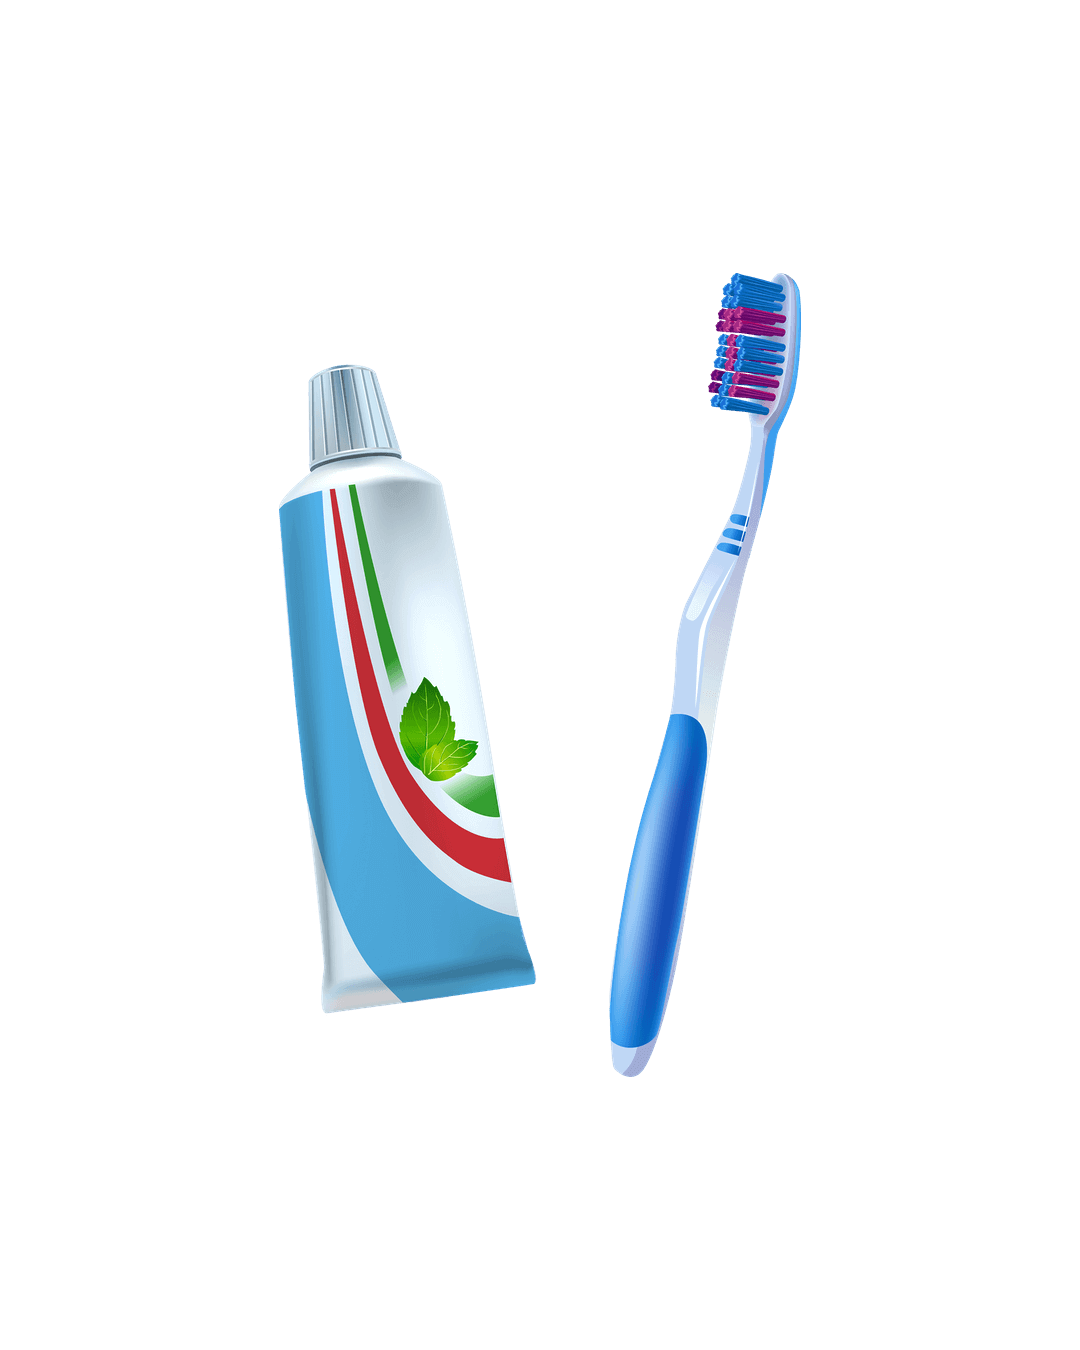 Asmens higiena